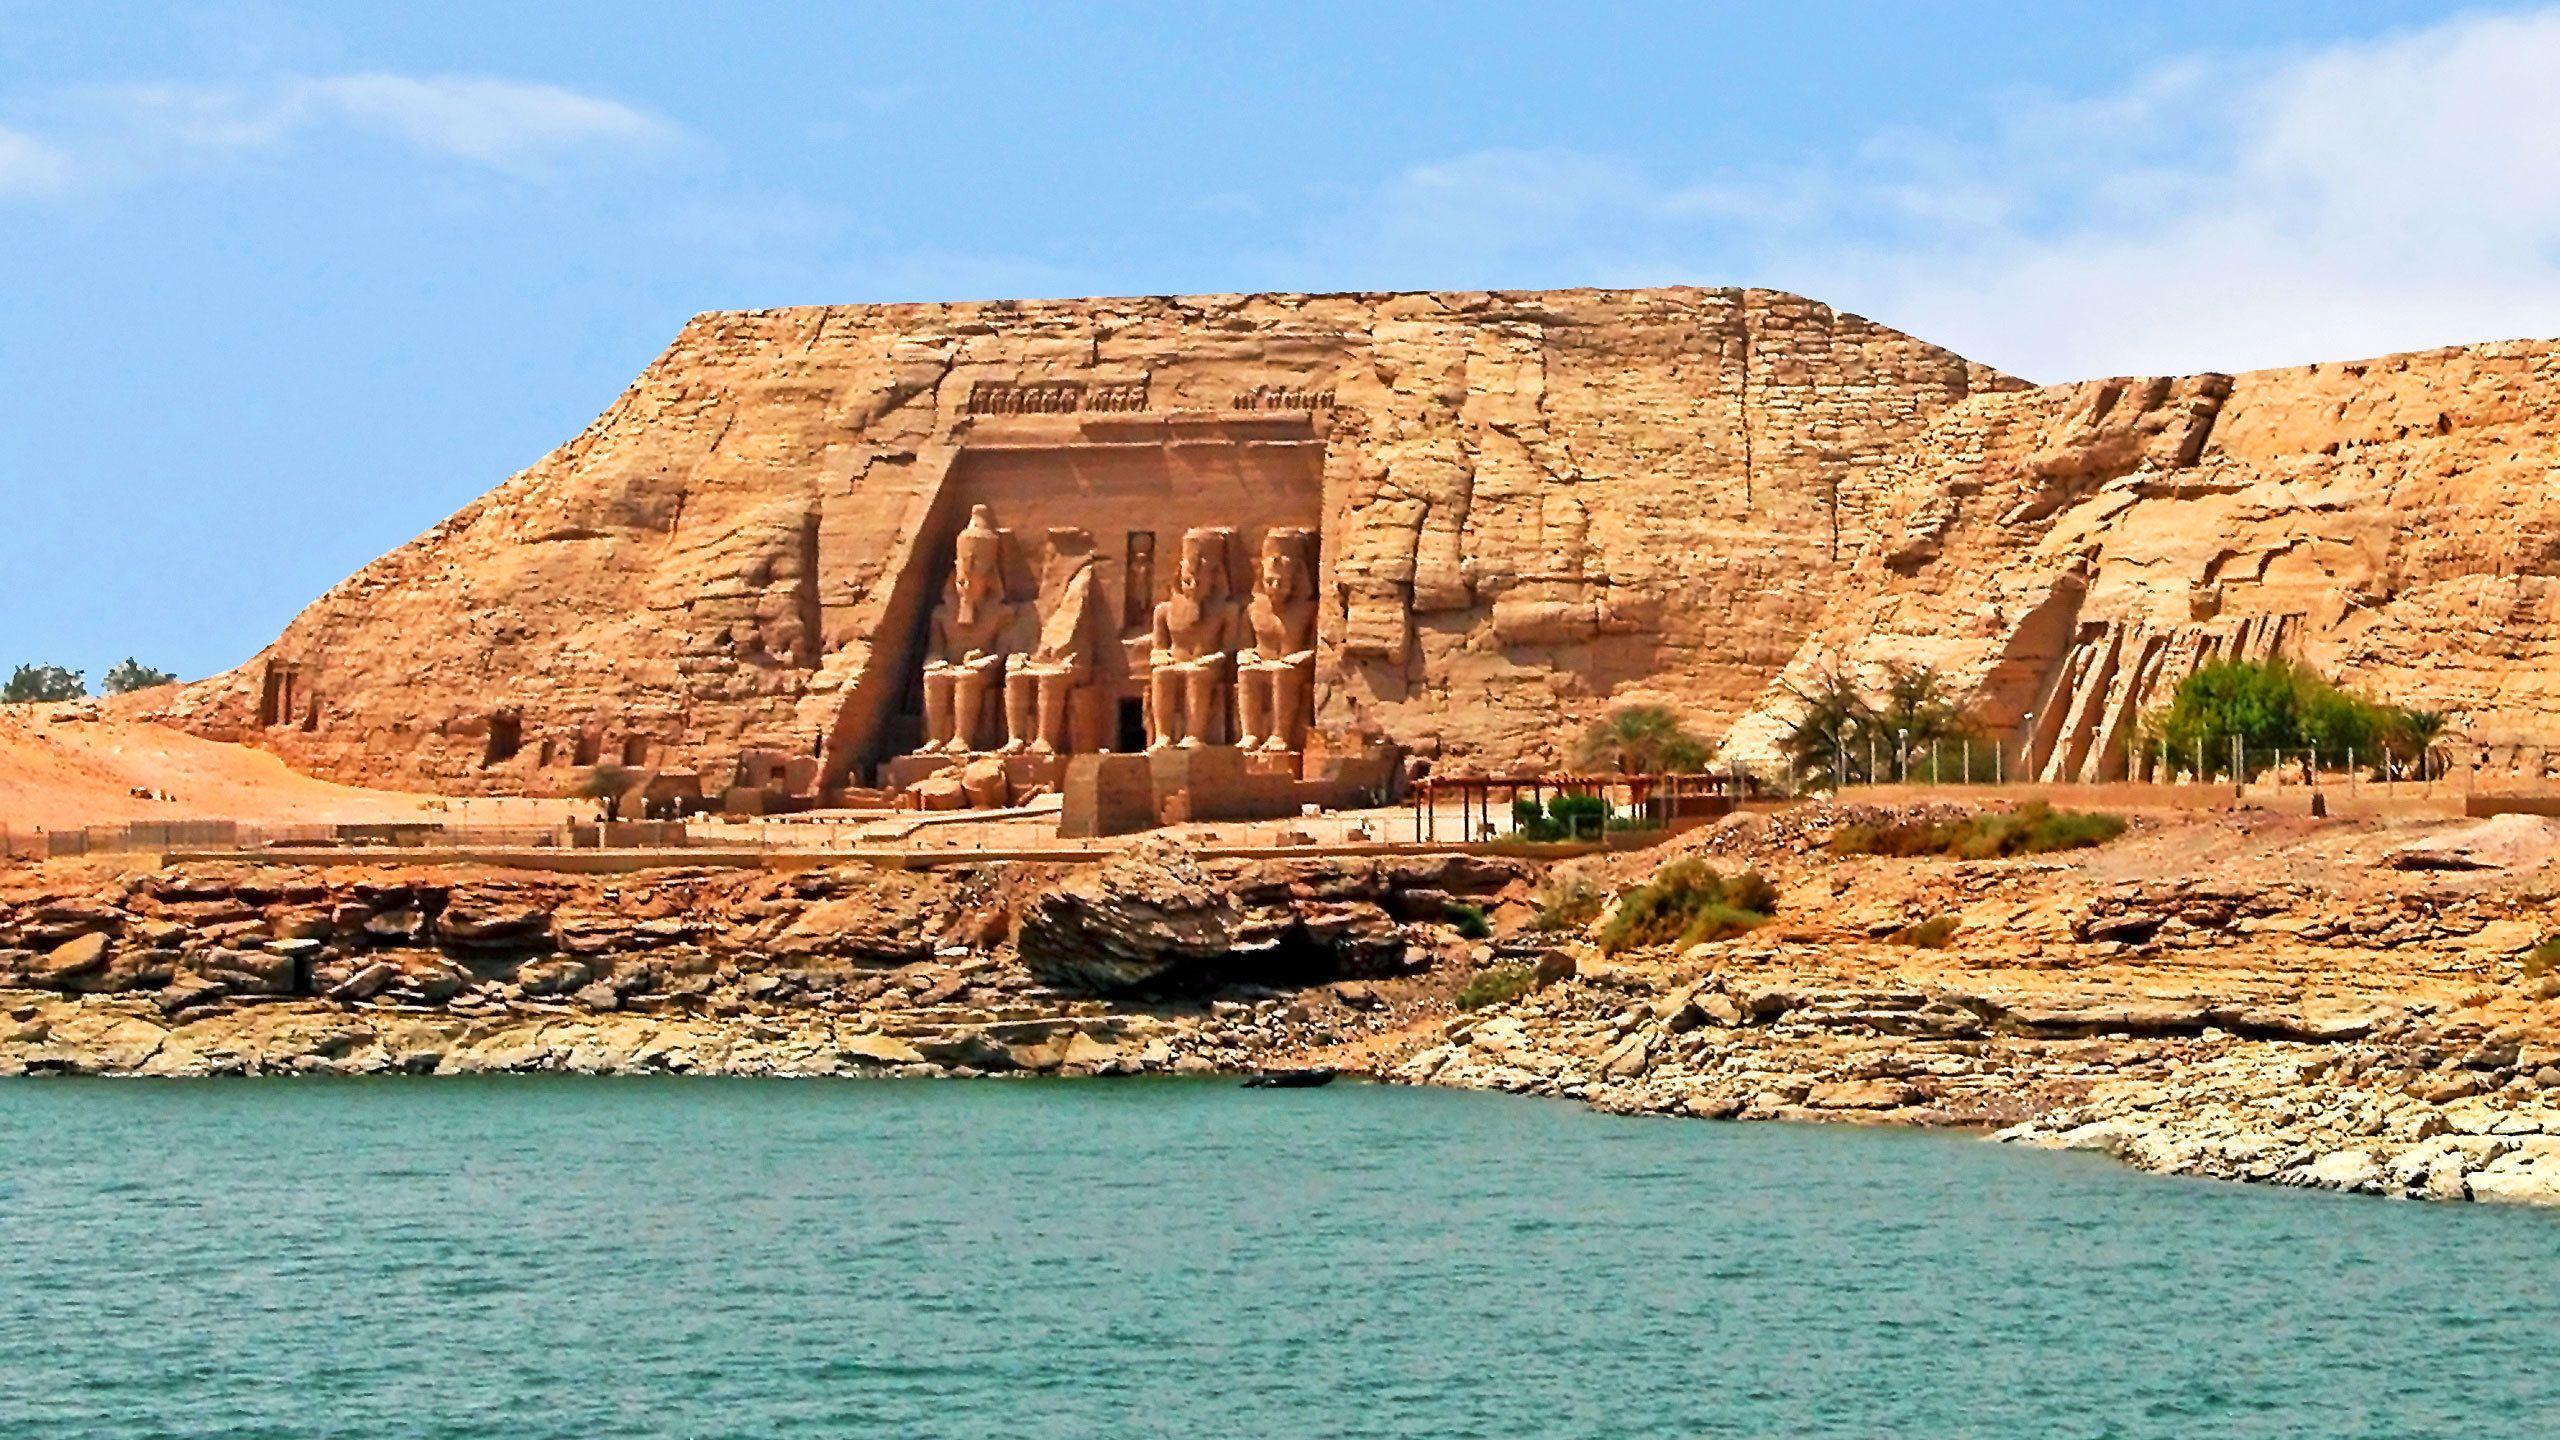 Temple of Abu Simbel along the bank of the Lake Nasser near Aswan